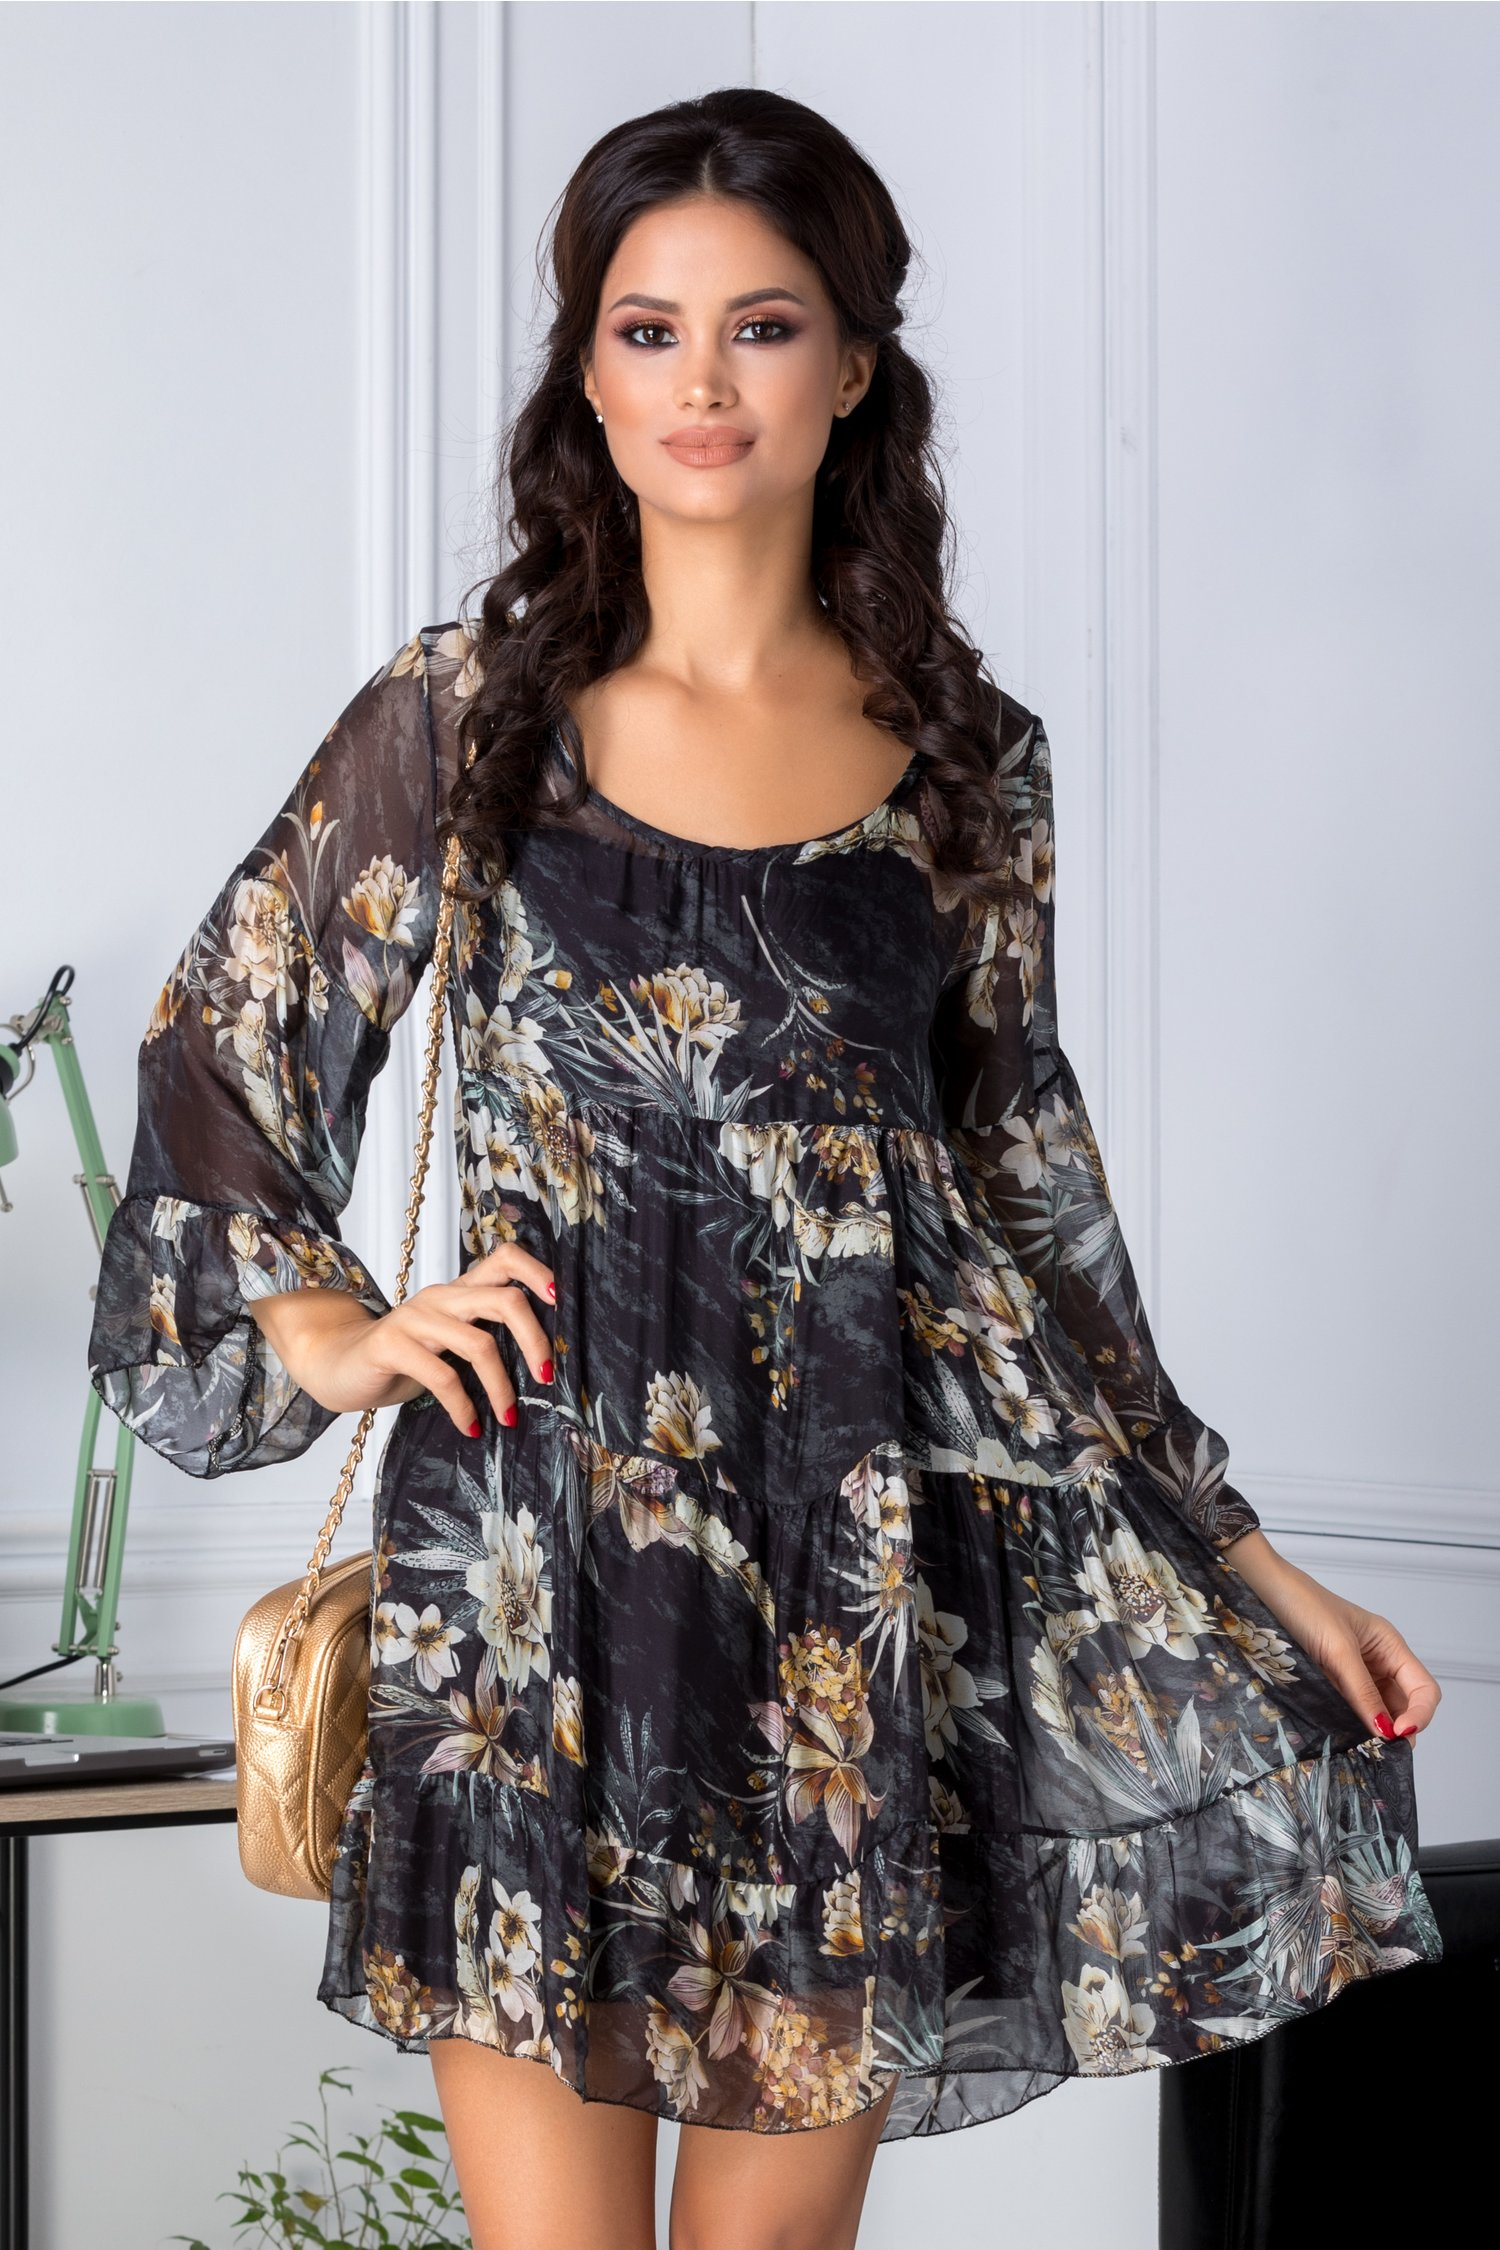 Rochie Dany neagra vaporoasa cu imprimeu floral